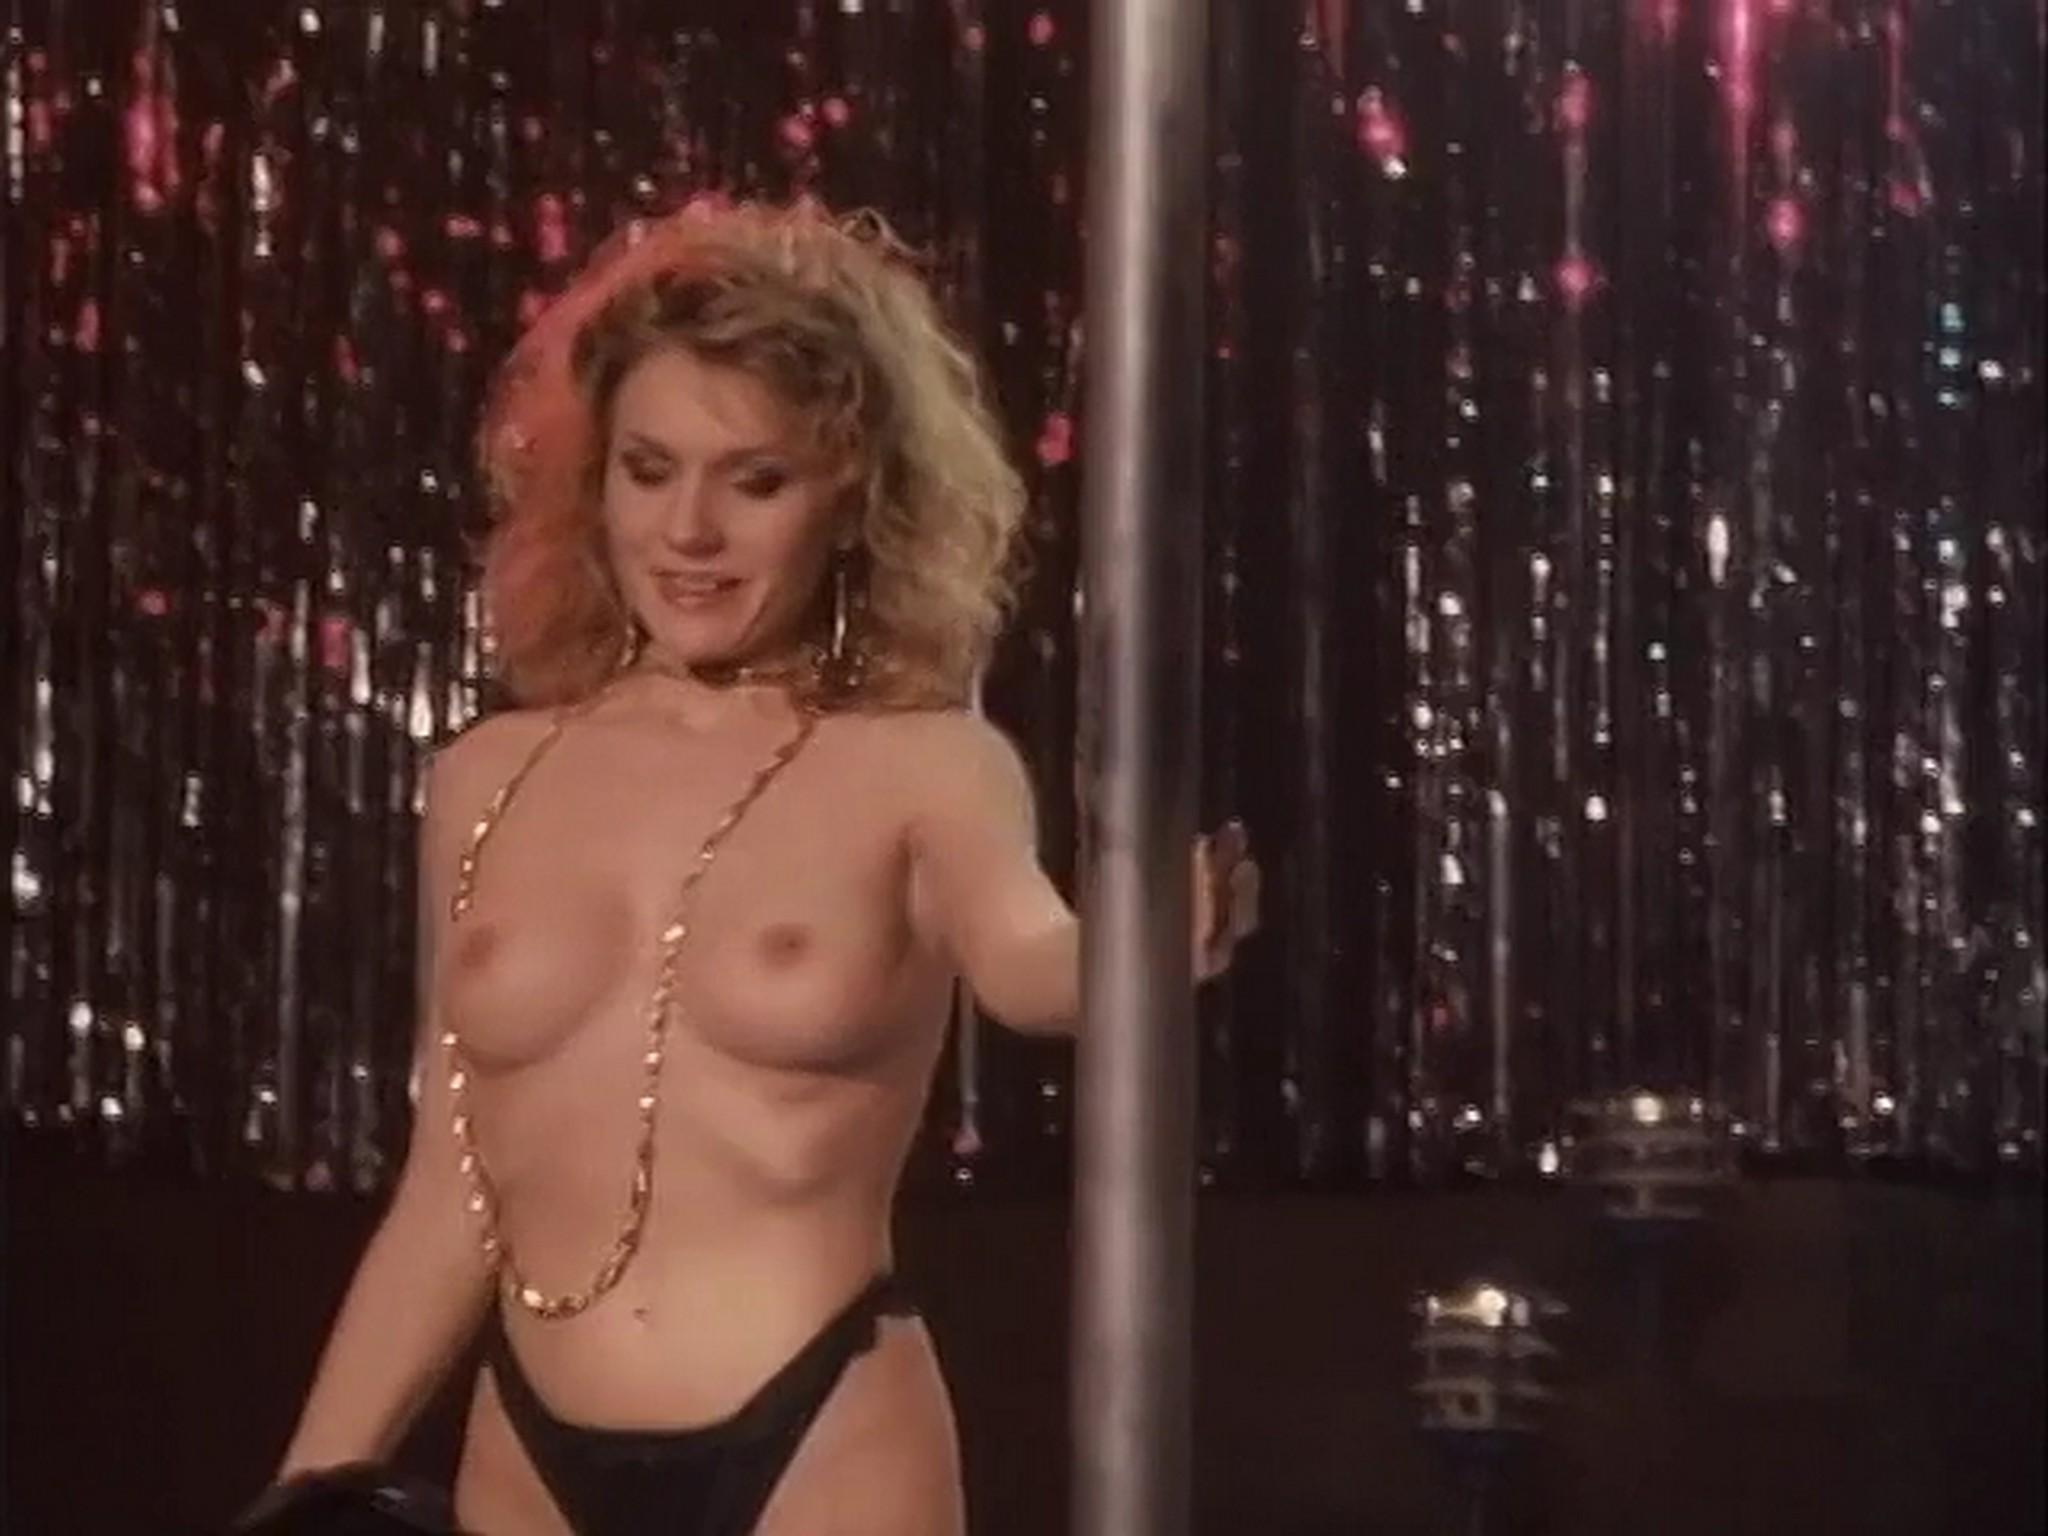 Barbara Alyn Woods nude Catya Sassoon Jill Pierce nude too as strippers Dance with Death 1991 9